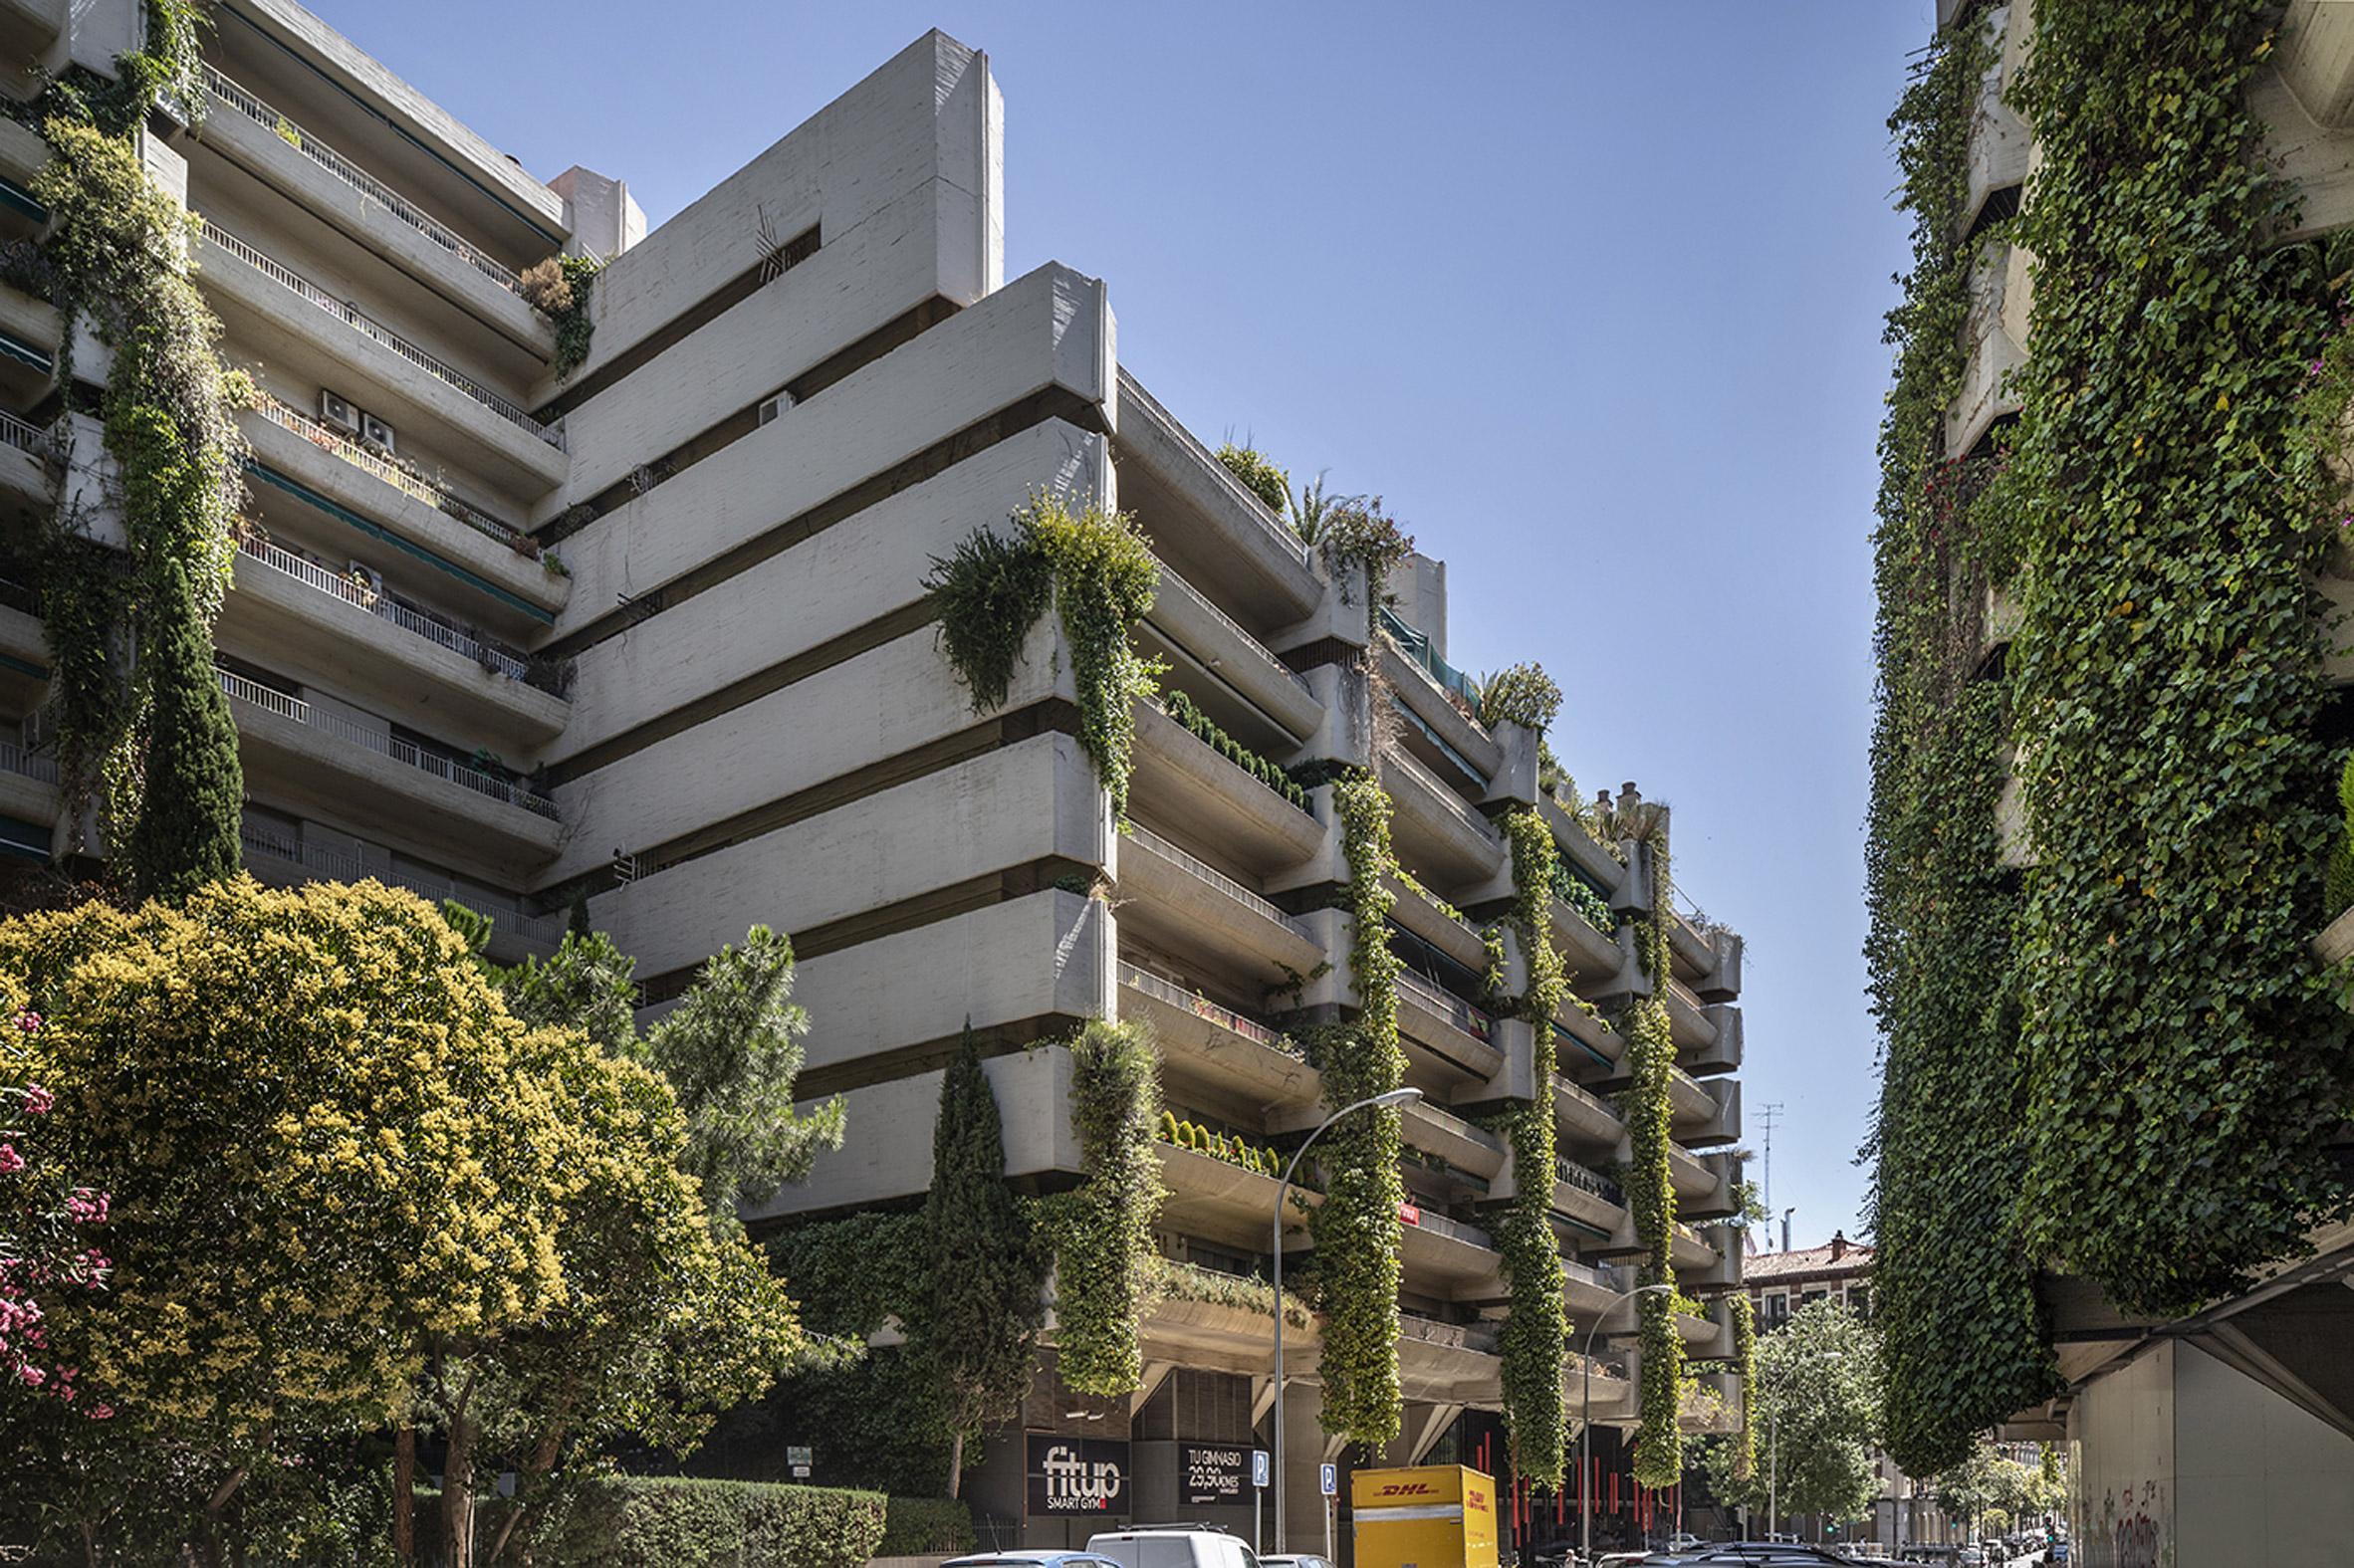 Green balconies at Edificio Princesa